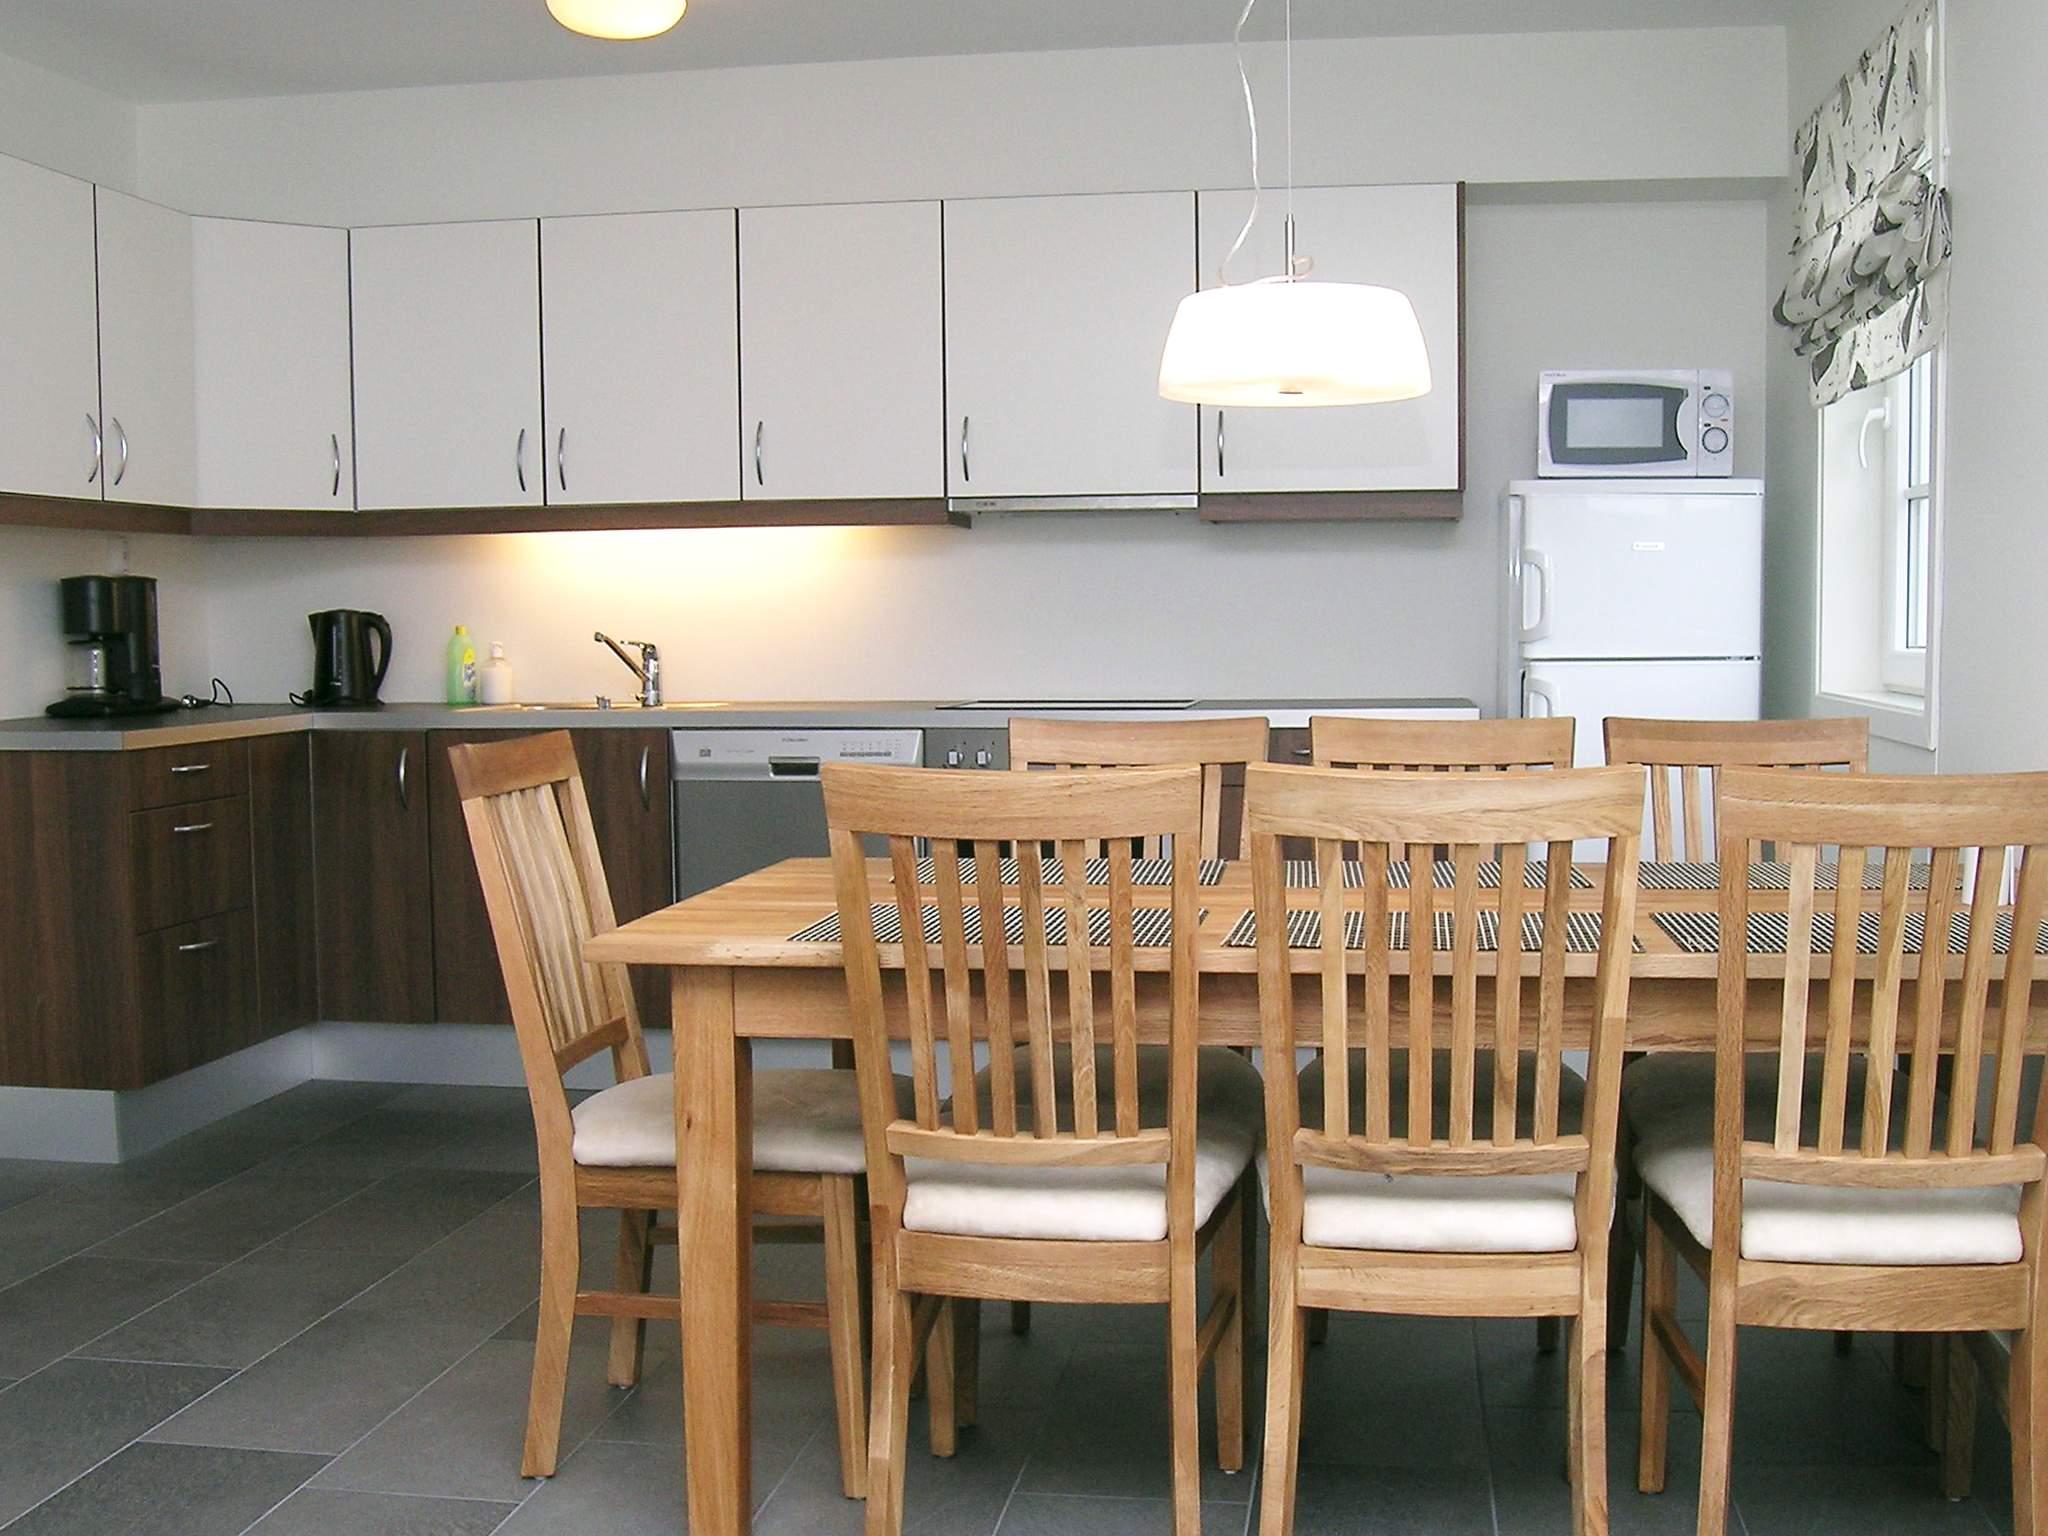 Ferienhaus Mølstrevåg (365130), Sveio, Hordaland - Hardangerfjord, Westnorwegen, Norwegen, Bild 18